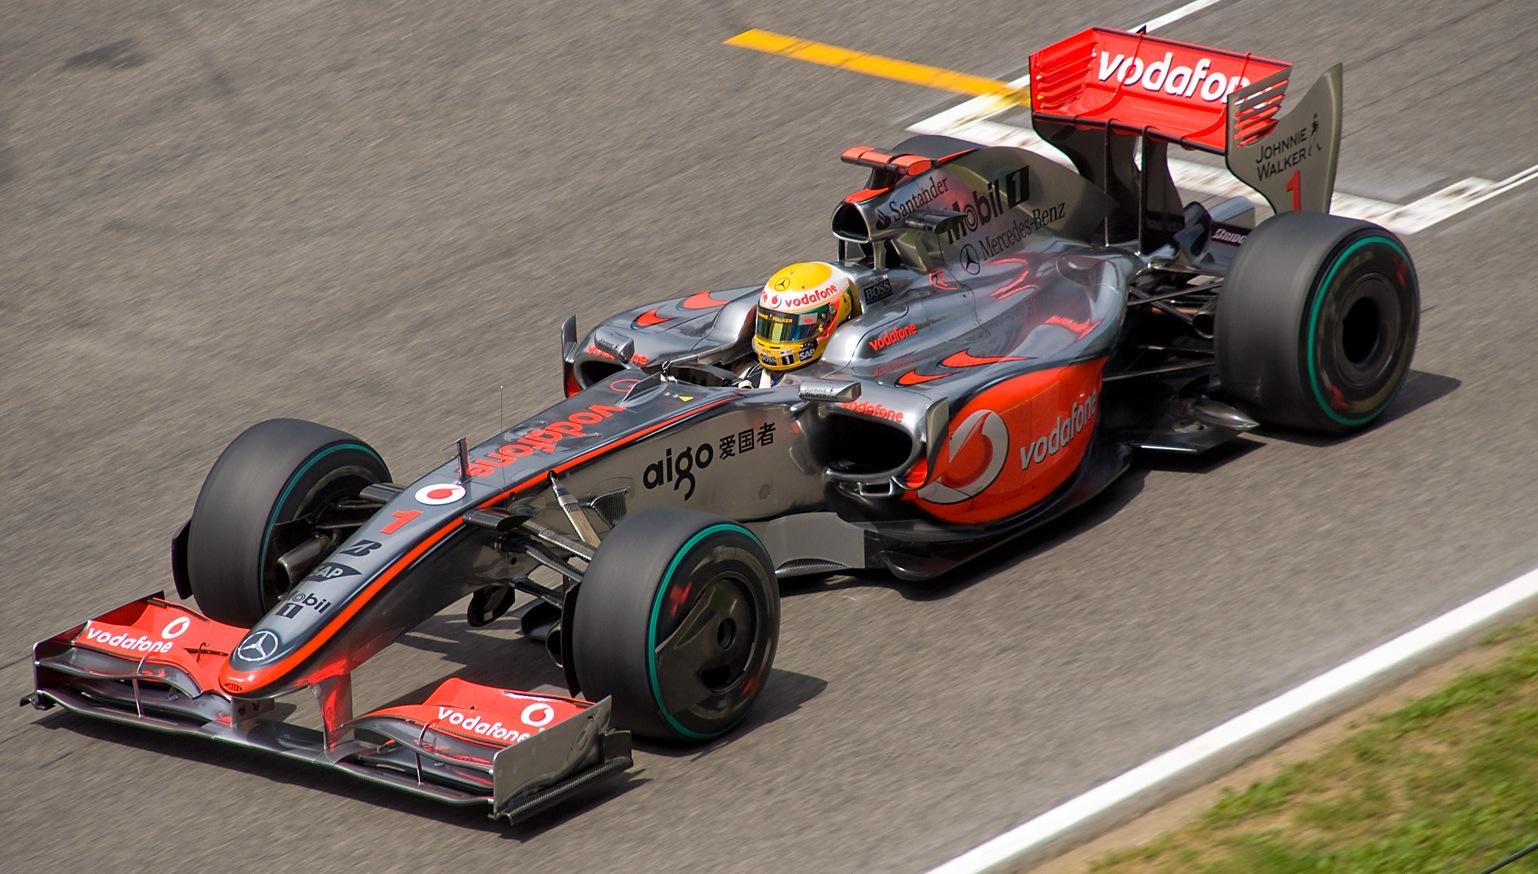 Mercedes Race Car Vent On Top